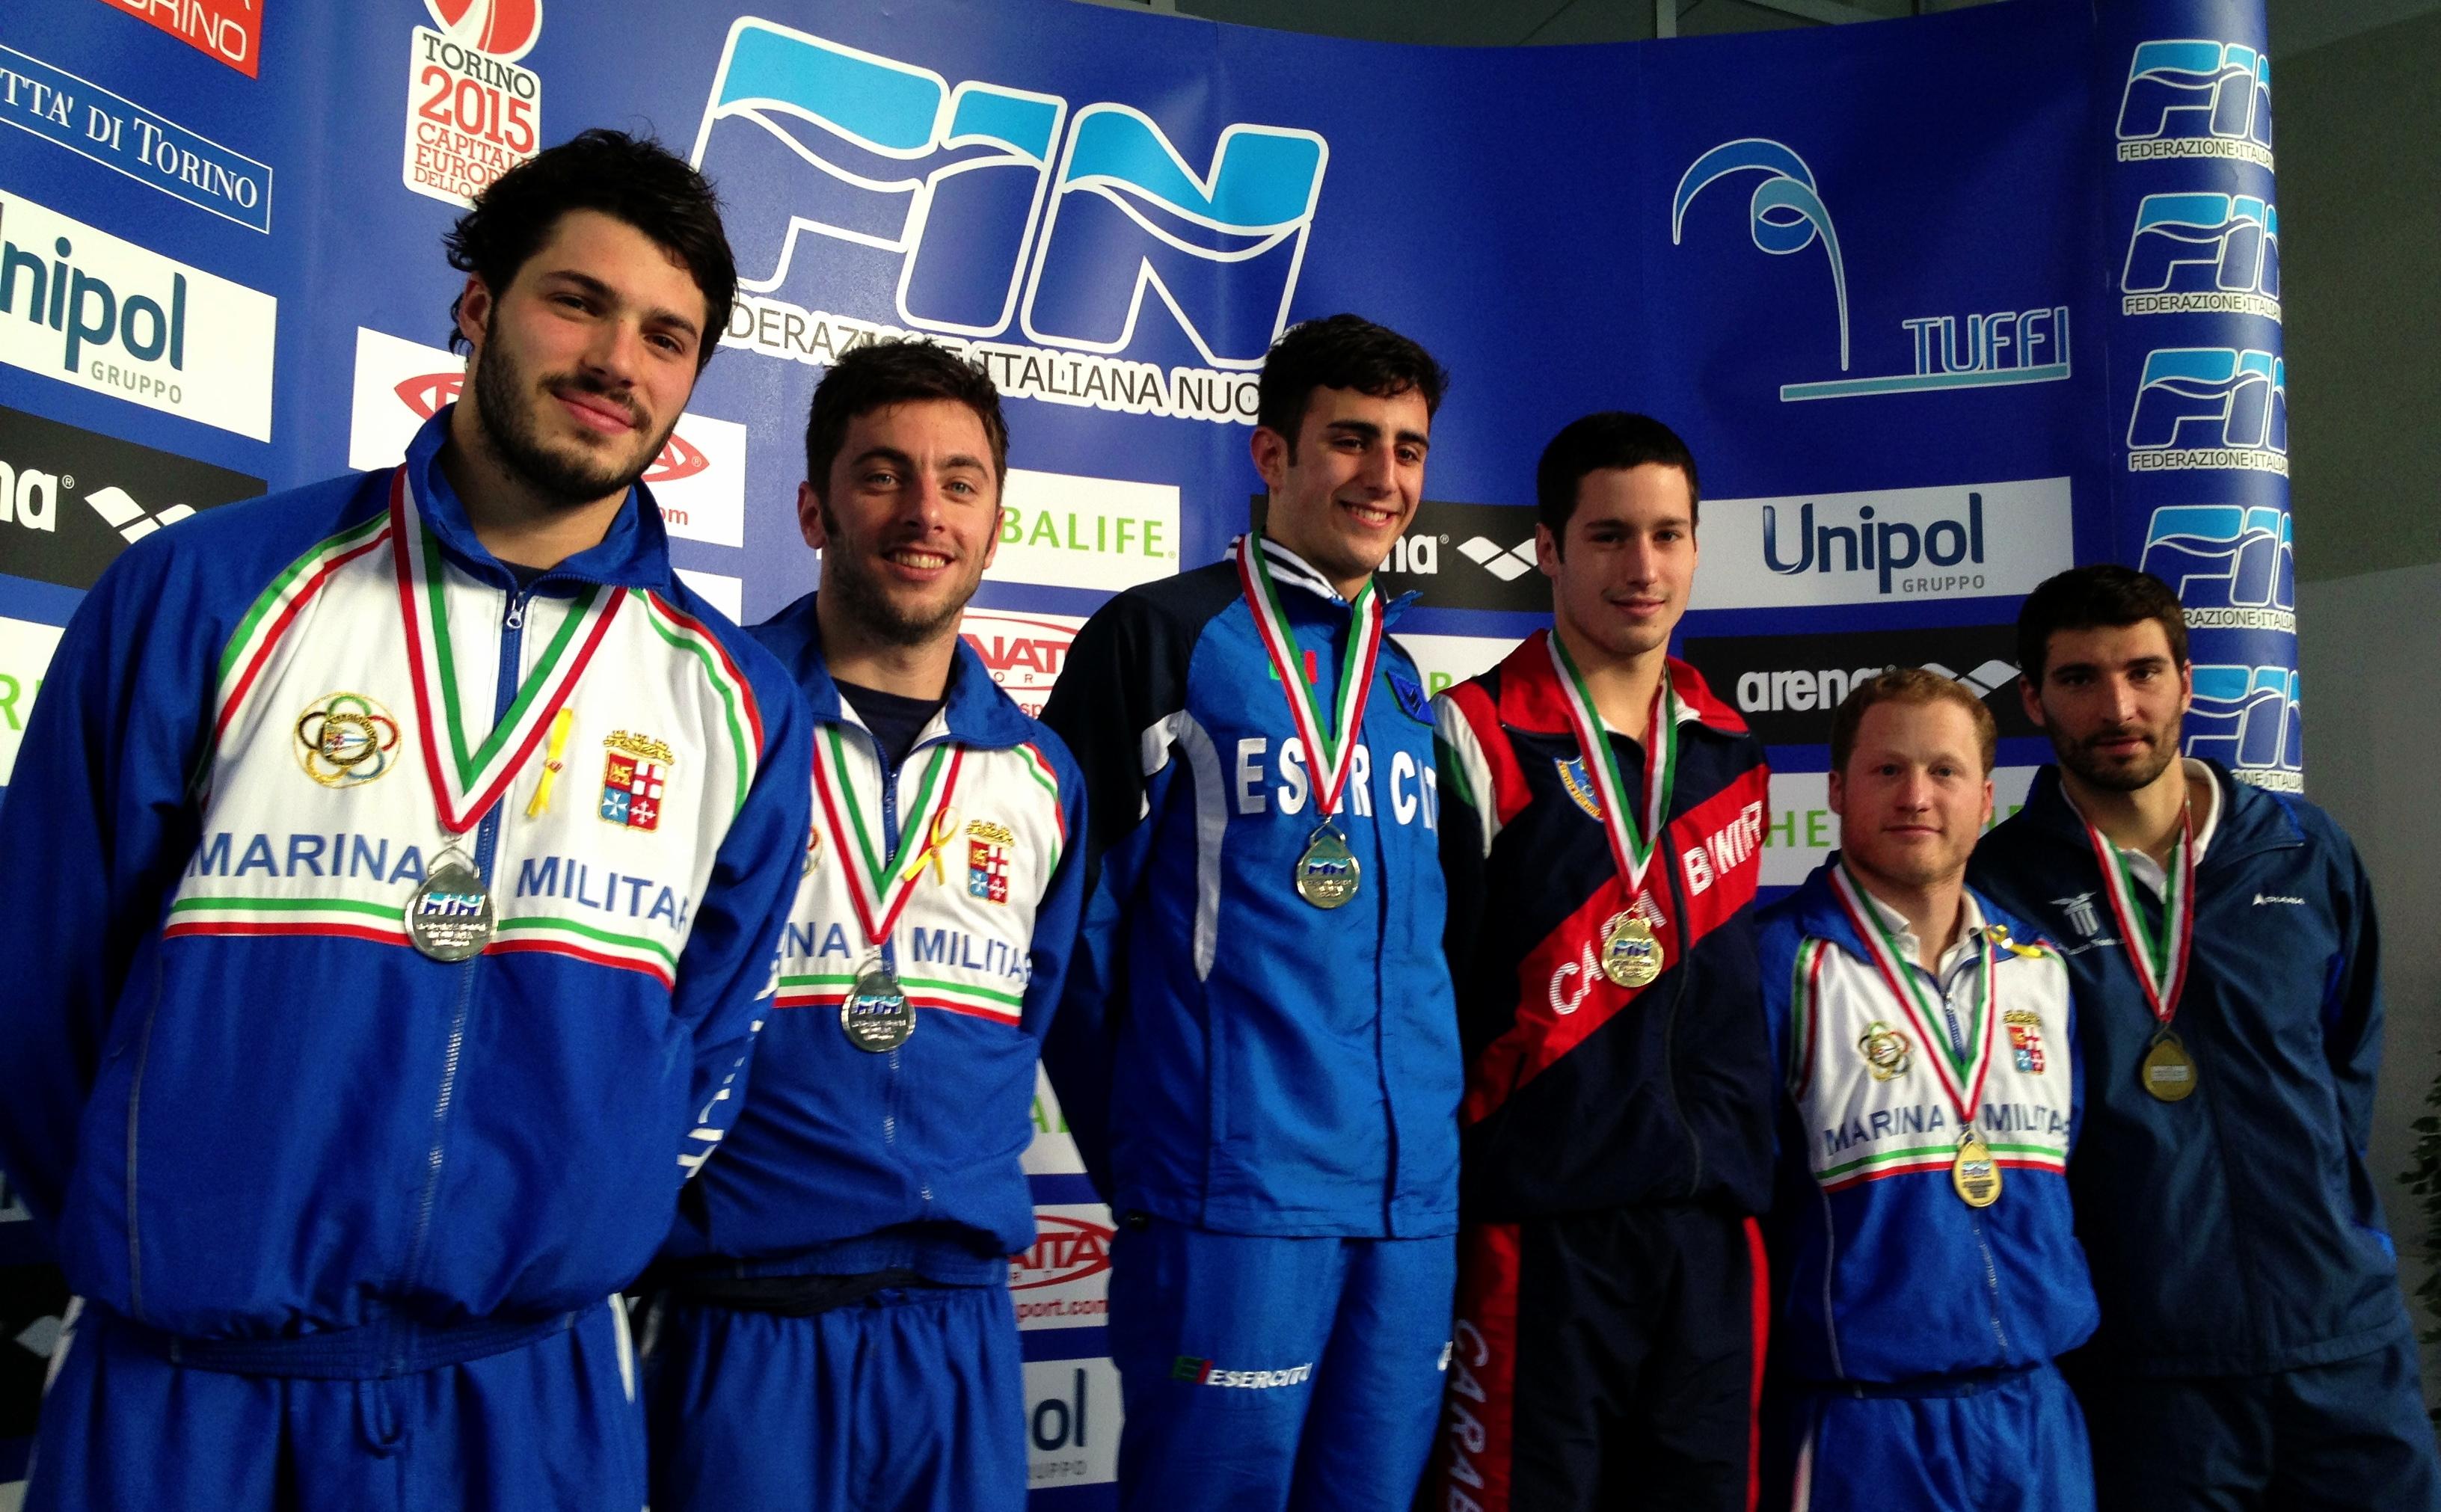 Tuffi Campionati Italiani assoluti invernali Torino 2013 007